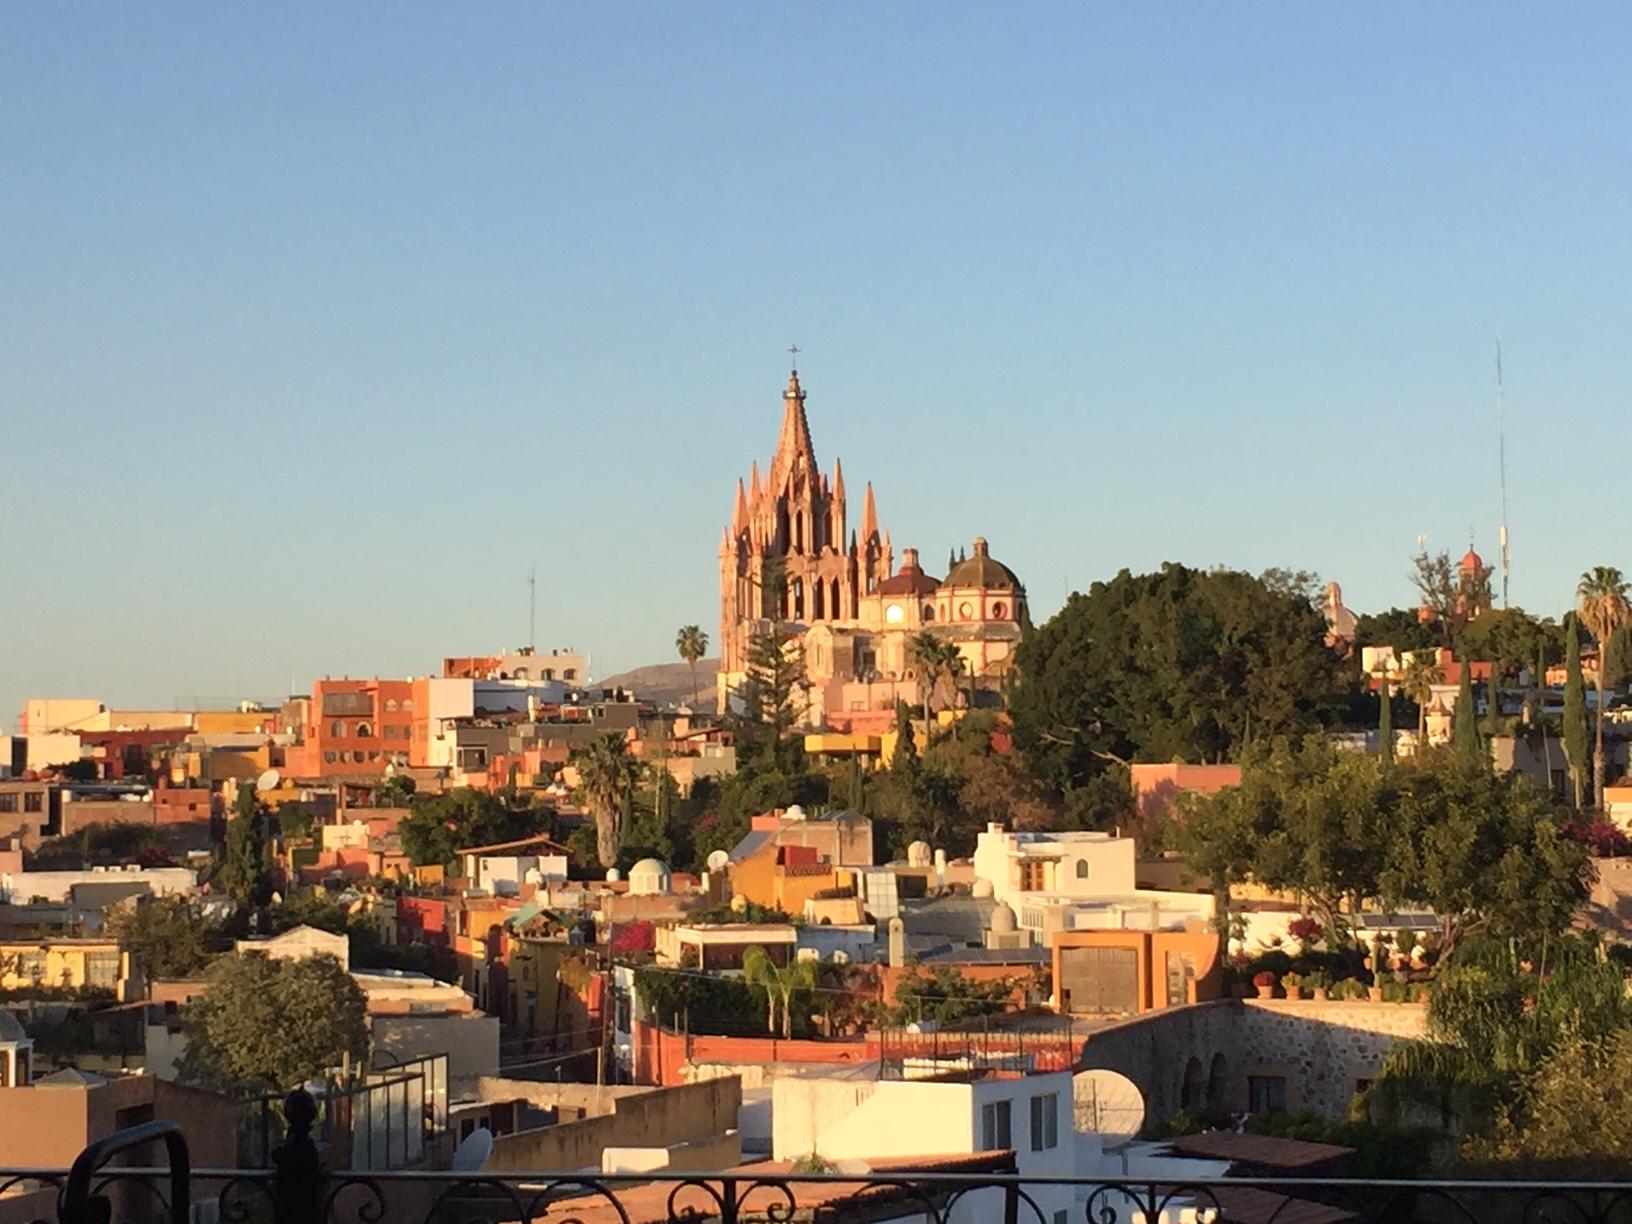 San Miguel de Allende Vista from Rosewood Hotel